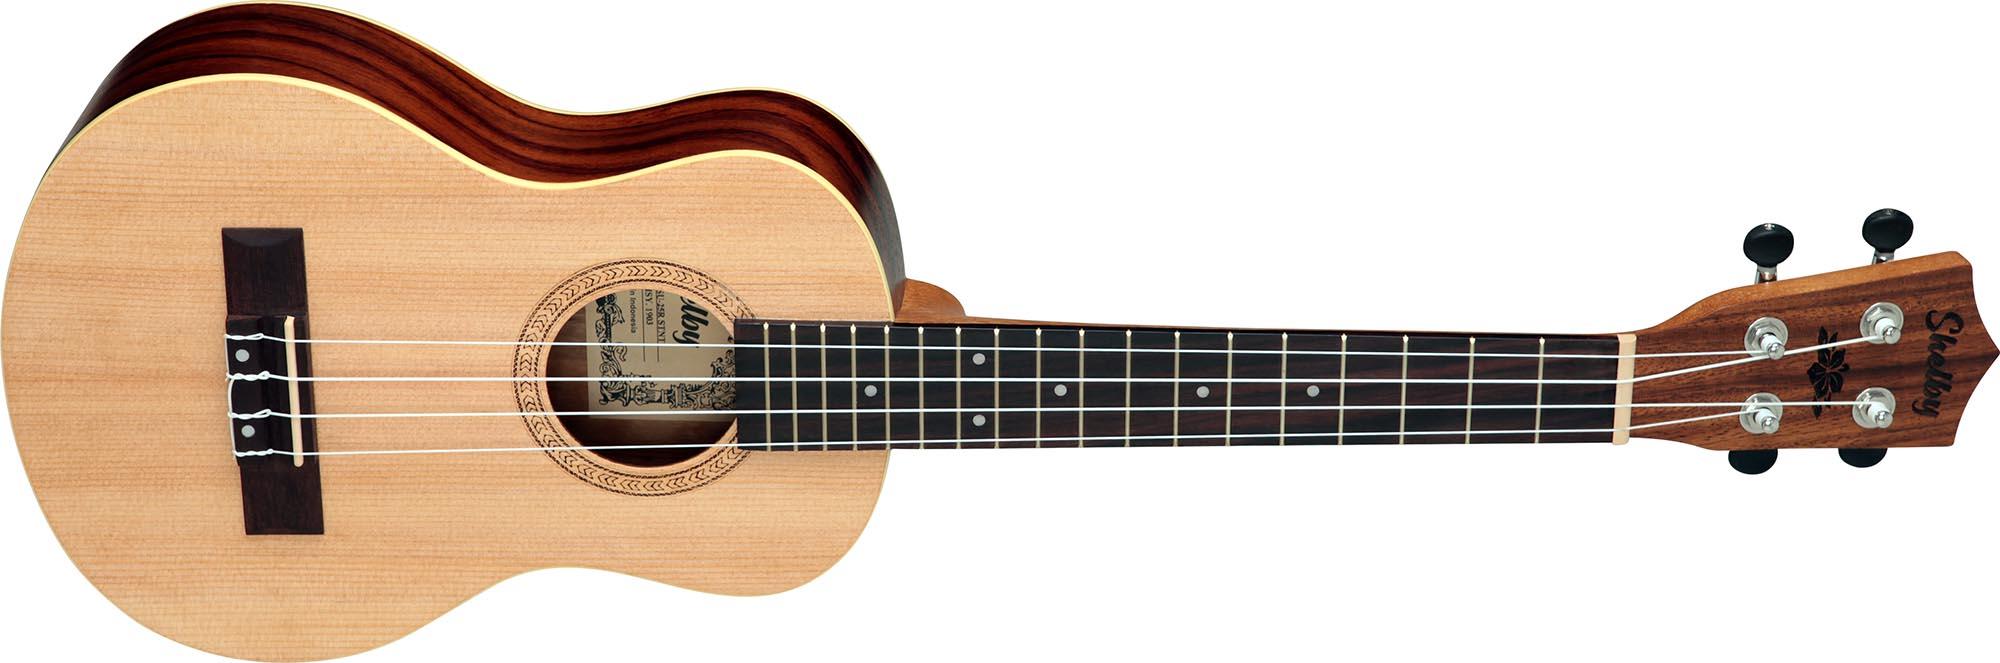 su25r ukulele tenor shelby su25r stnt jacaranda acetinado visao frontal